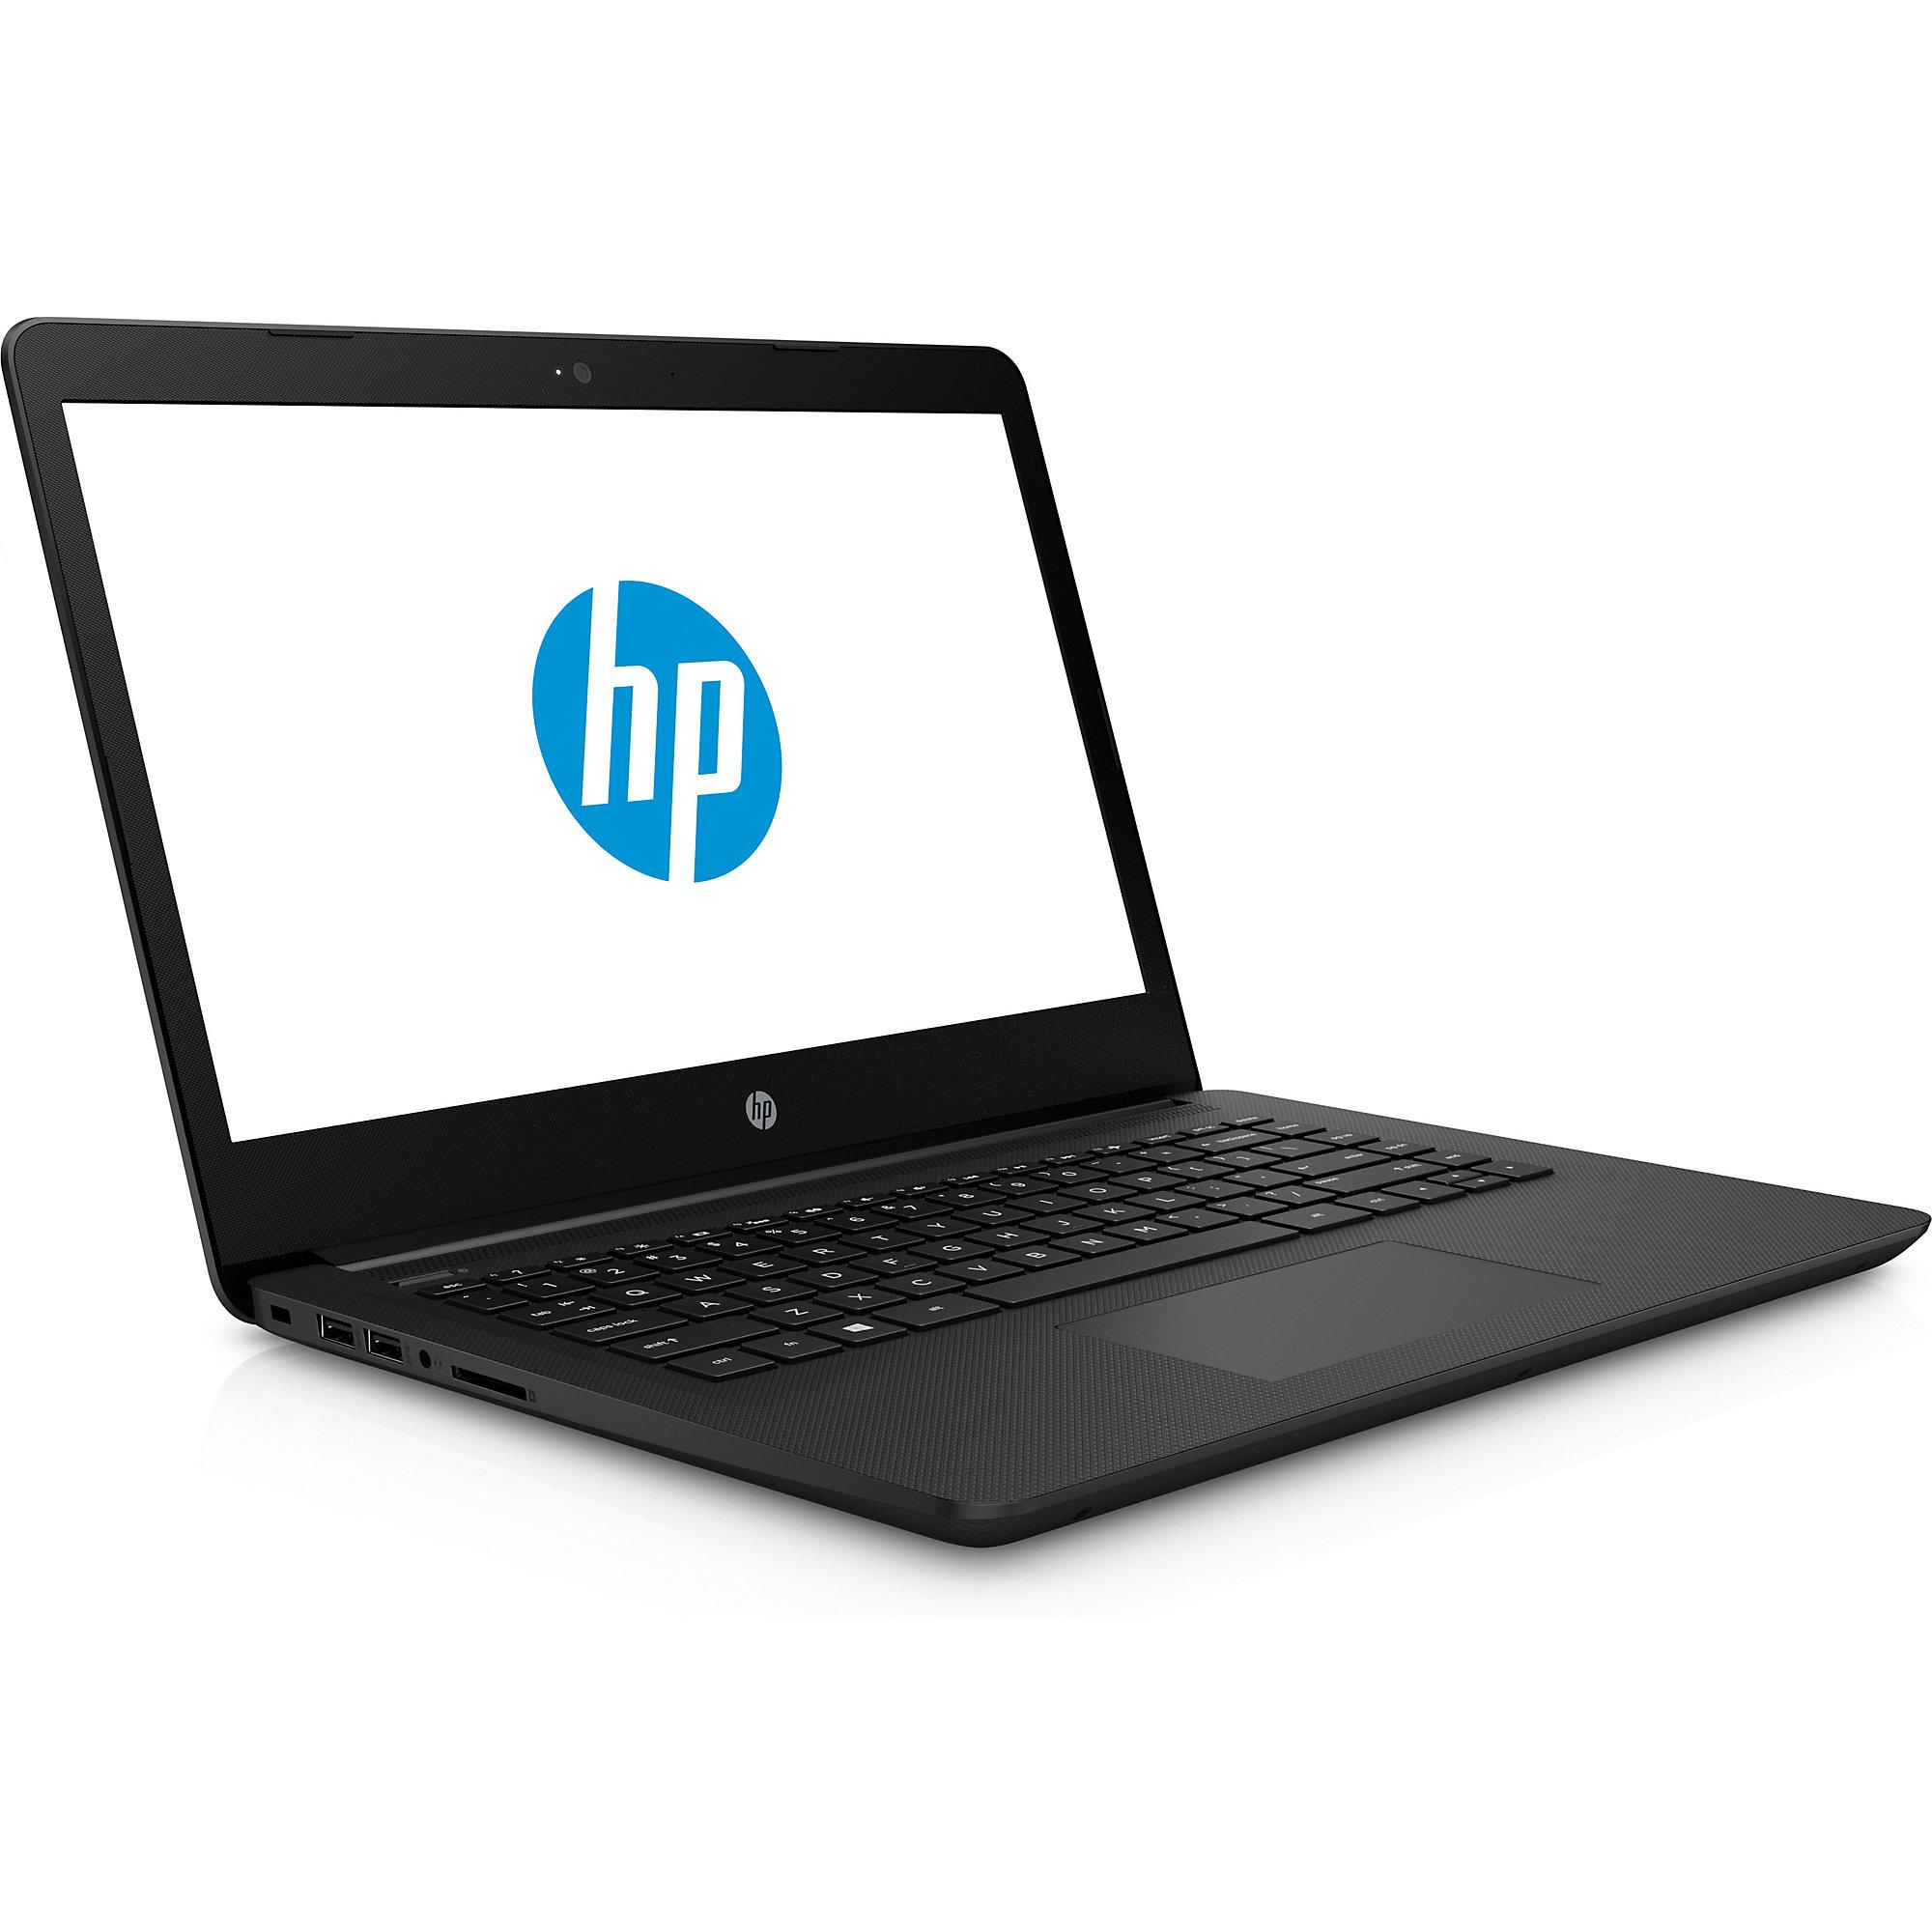 Hp 14 N3710 Hd405 Laptop Review Reviews Diagram Of Internal Computer Parts Full Resolution